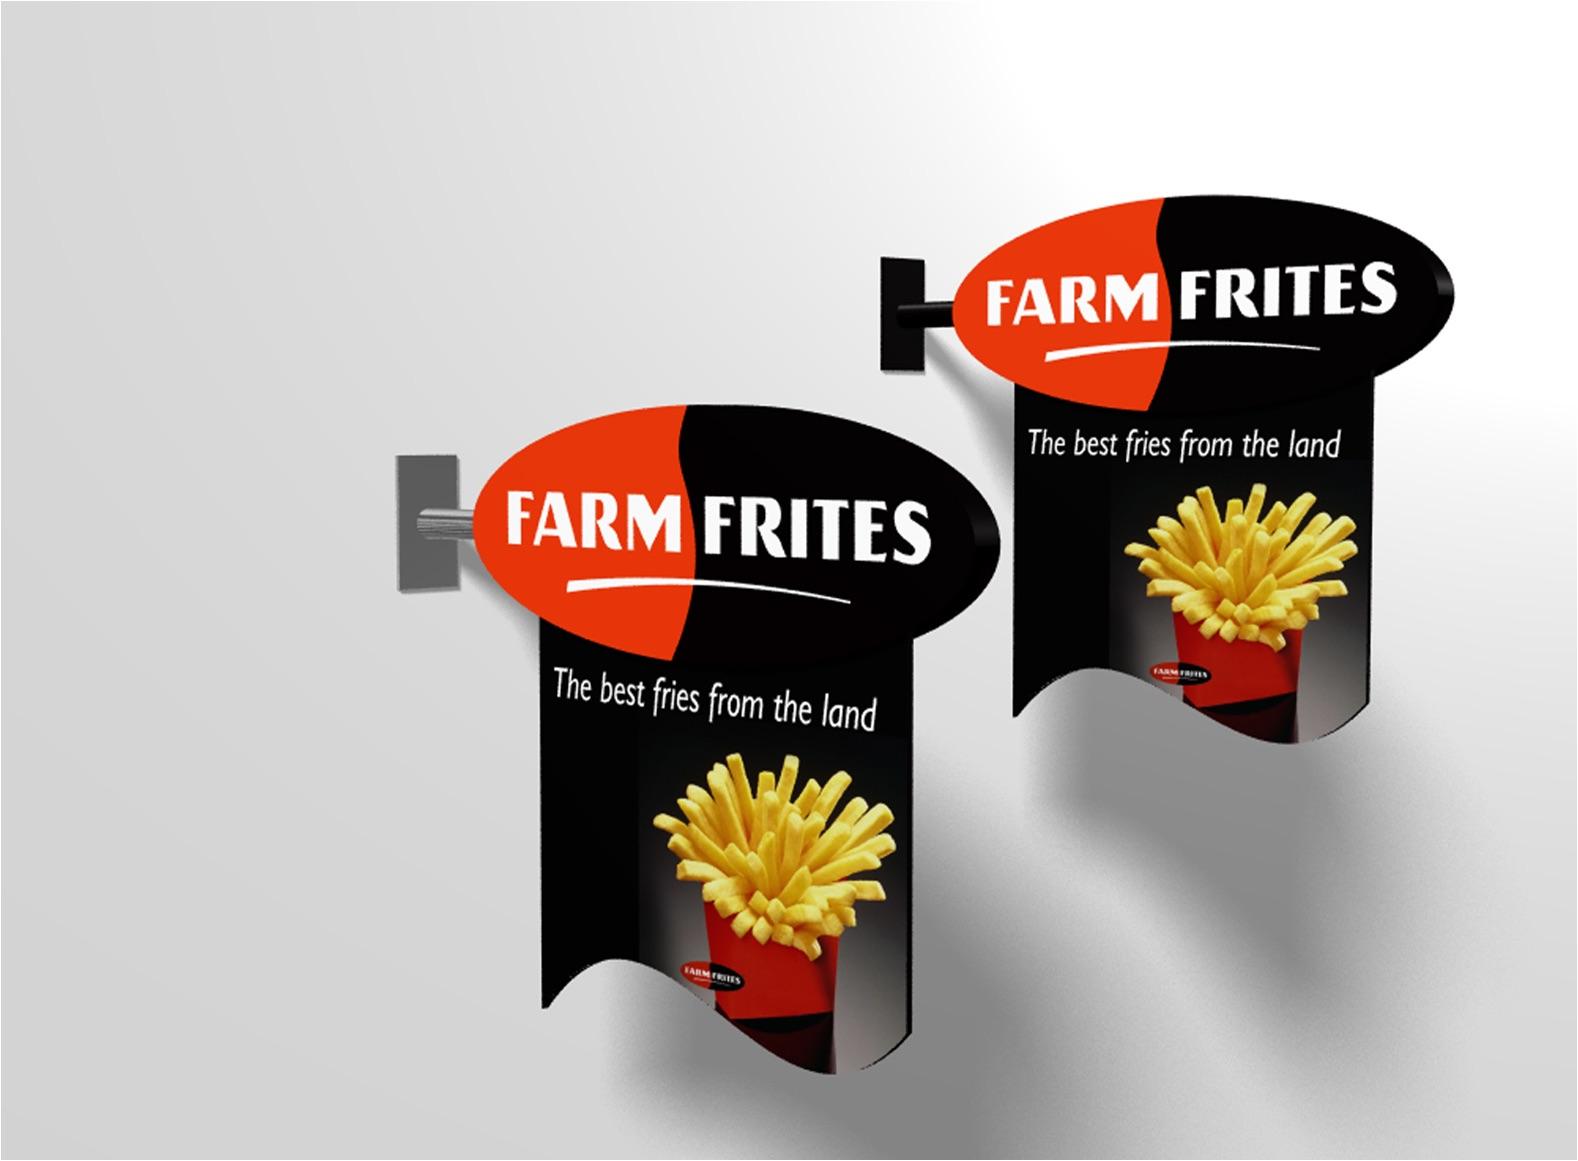 farmfrites-1.jpeg